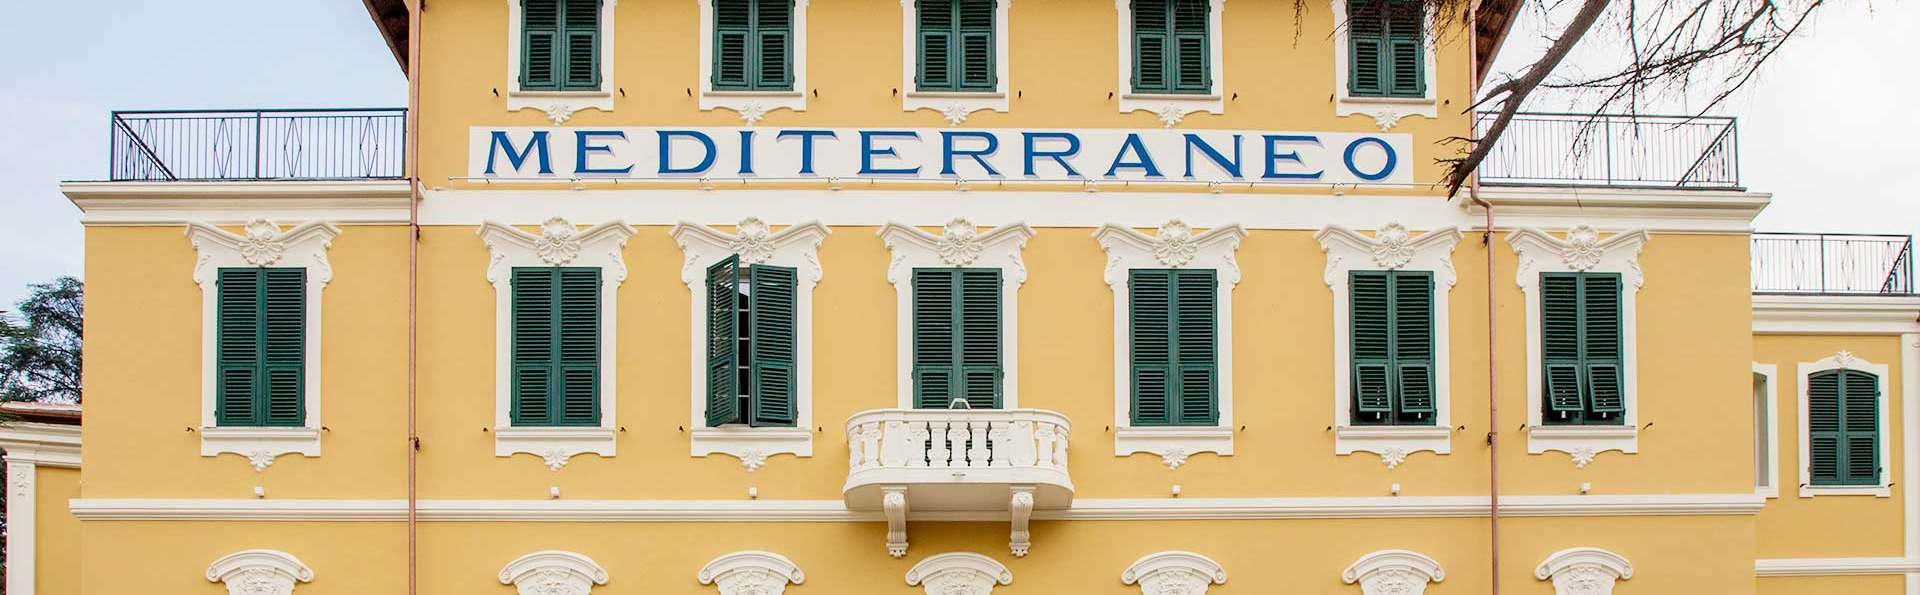 Mediterraneo Emotional Hotel & Spa - EDIT_FRONT_01.jpg